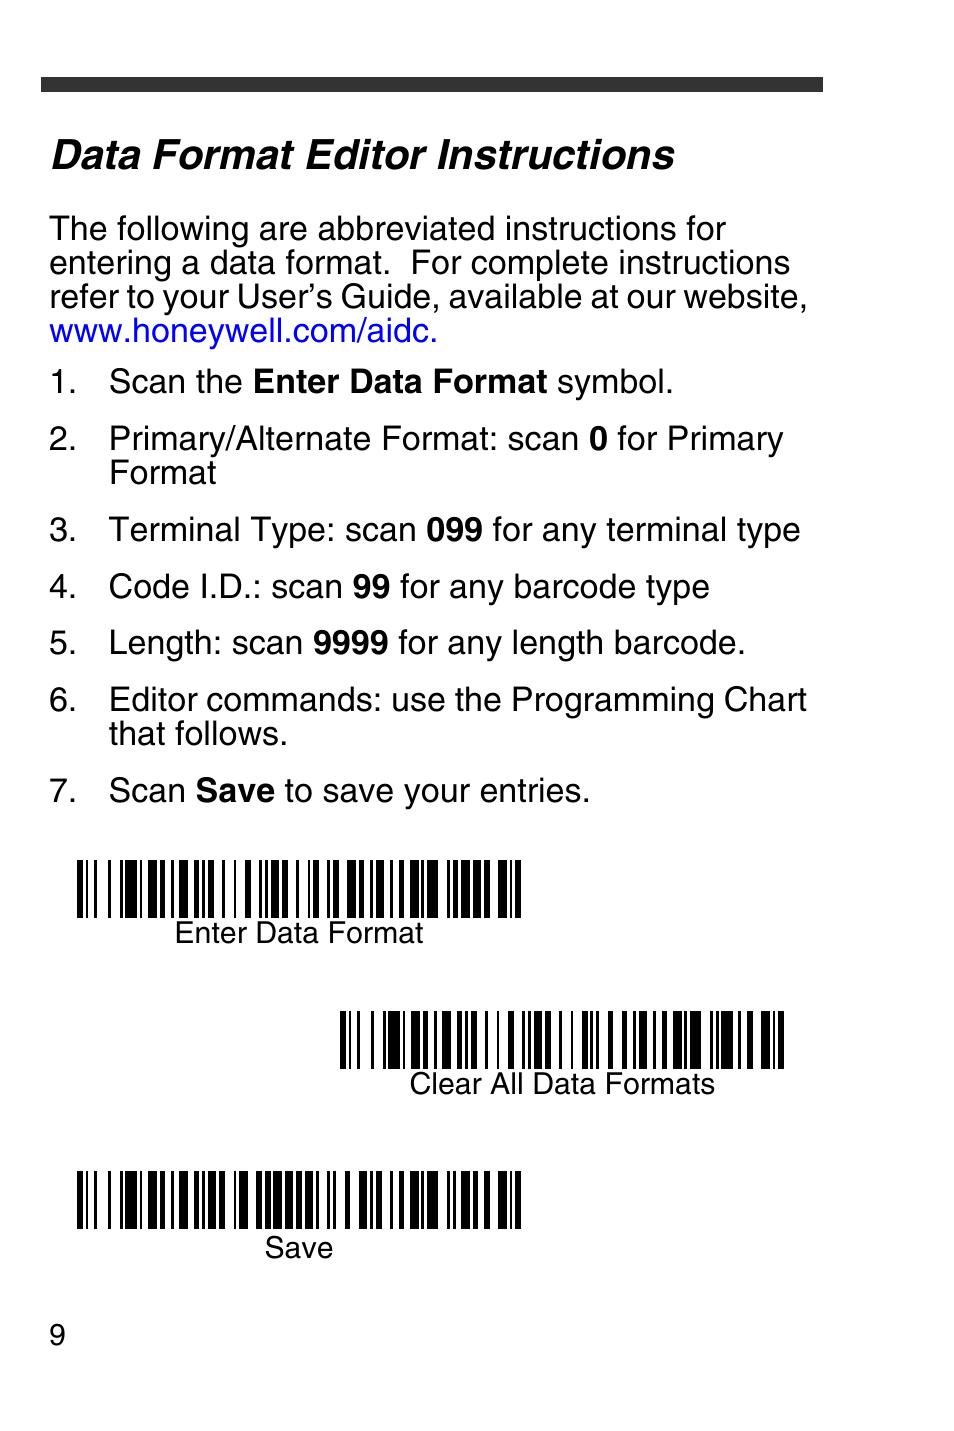 data format editor instructions honeywell 4600g user manual page rh manualsdir com honeywell 4600g scanner user manual Honeywell 4600G Driver Windows 7